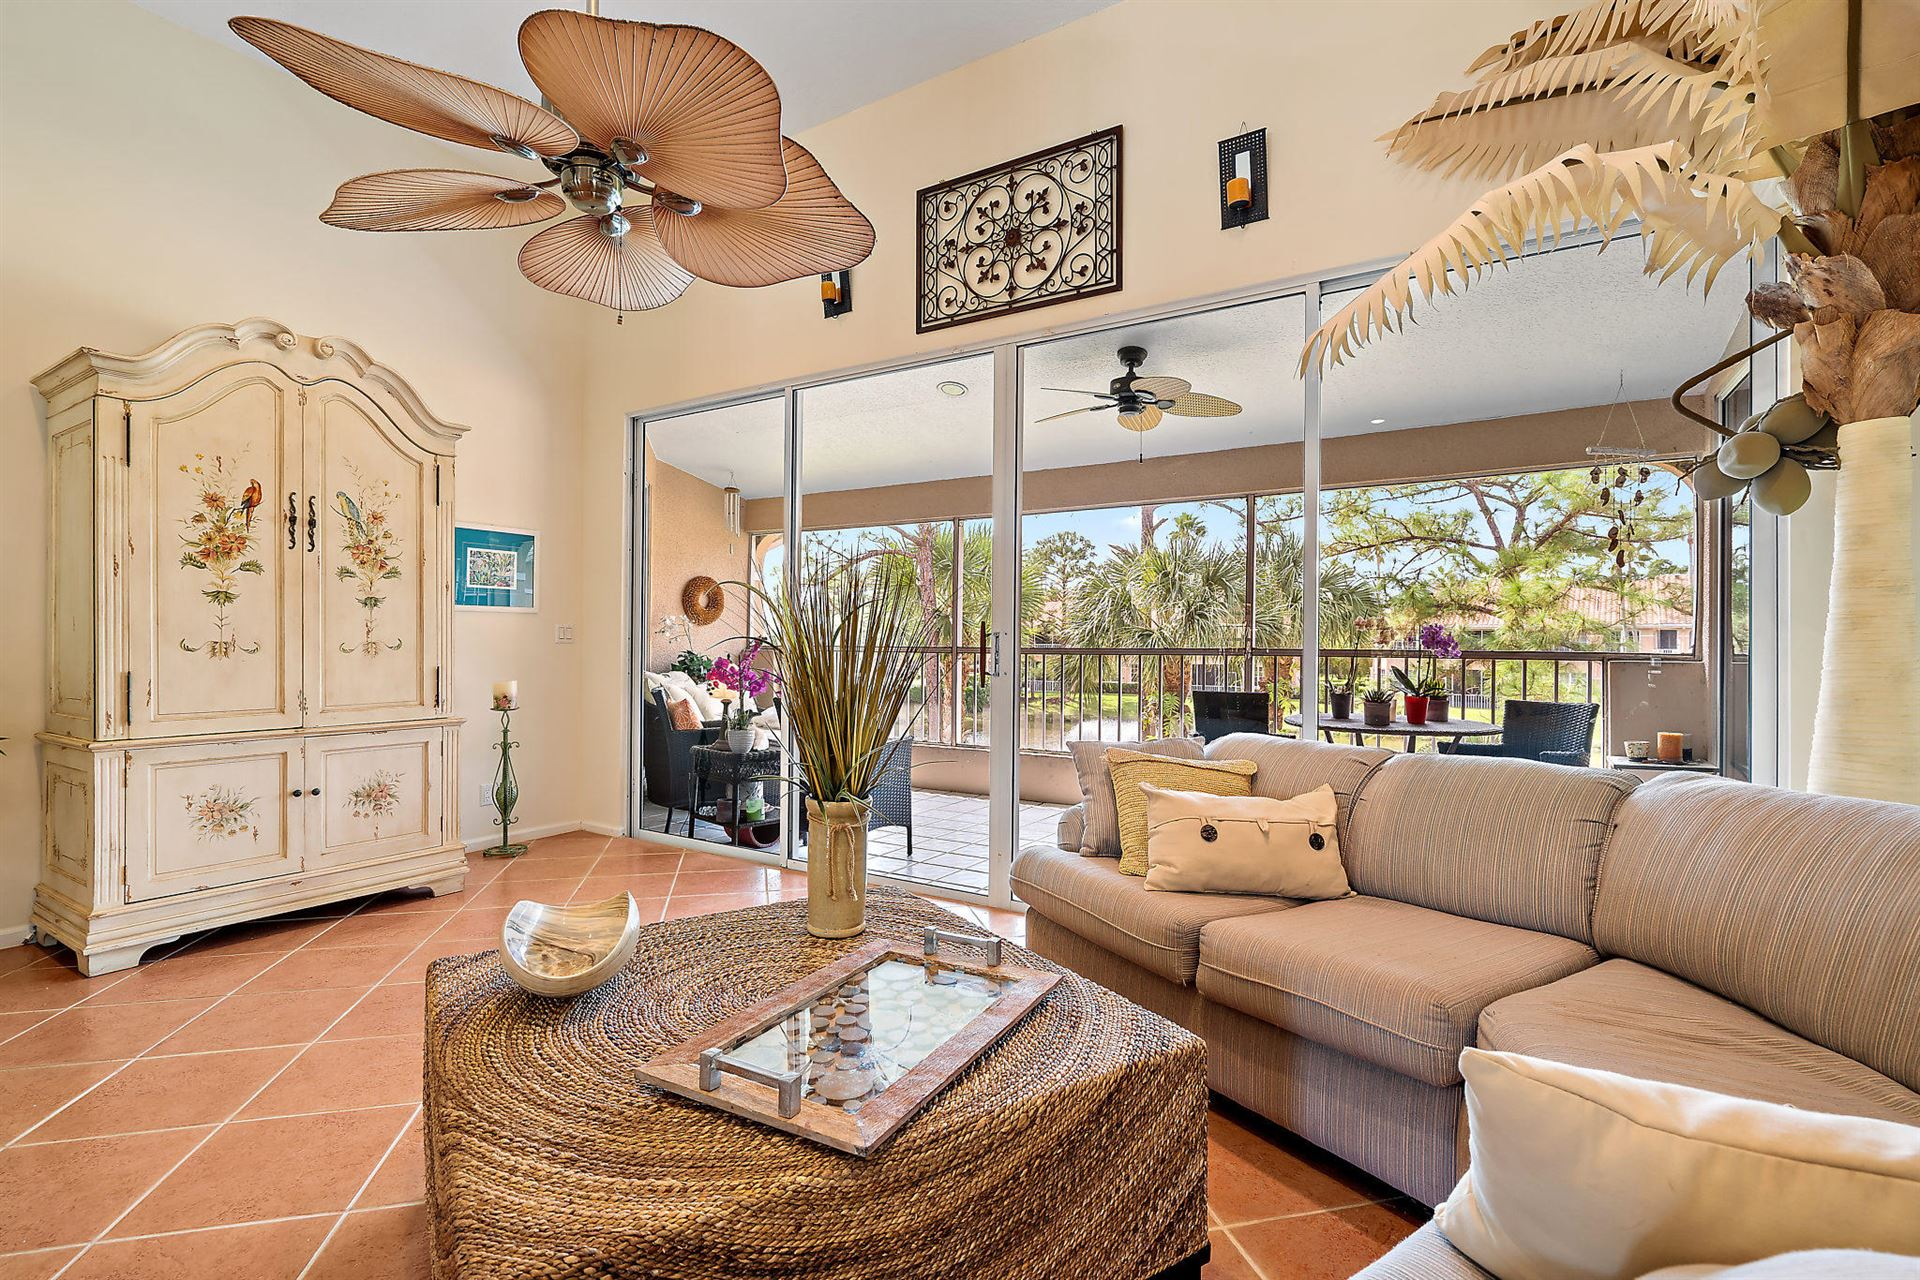 Photo of 220 Legendary Circle, Palm Beach Gardens, FL 33418 (MLS # RX-10576175)